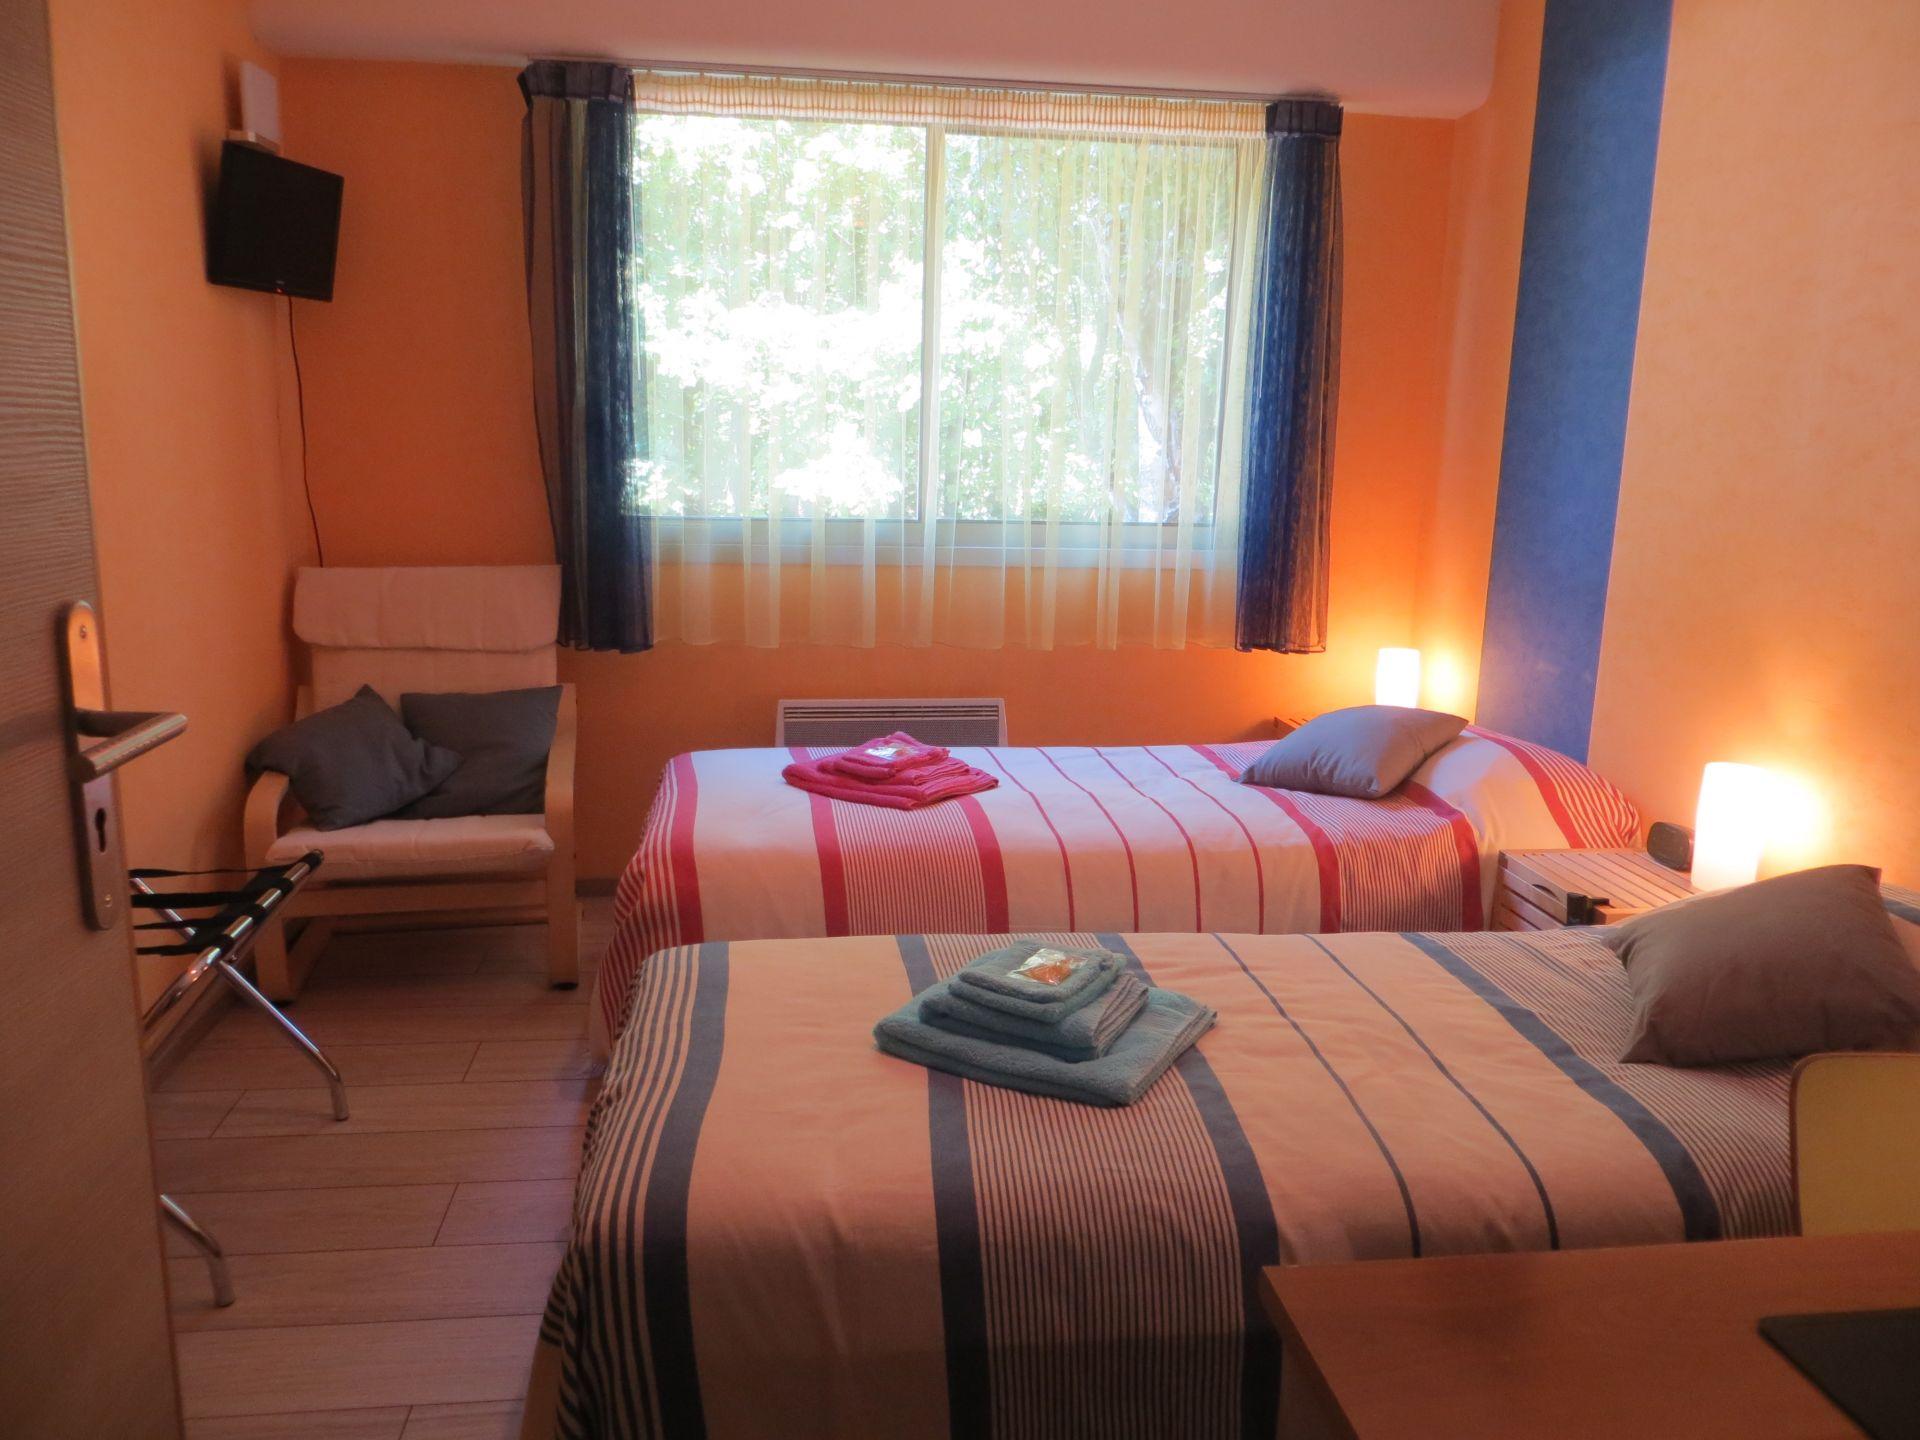 chambres d 39 hotes mes oasis lorraine tourisme. Black Bedroom Furniture Sets. Home Design Ideas